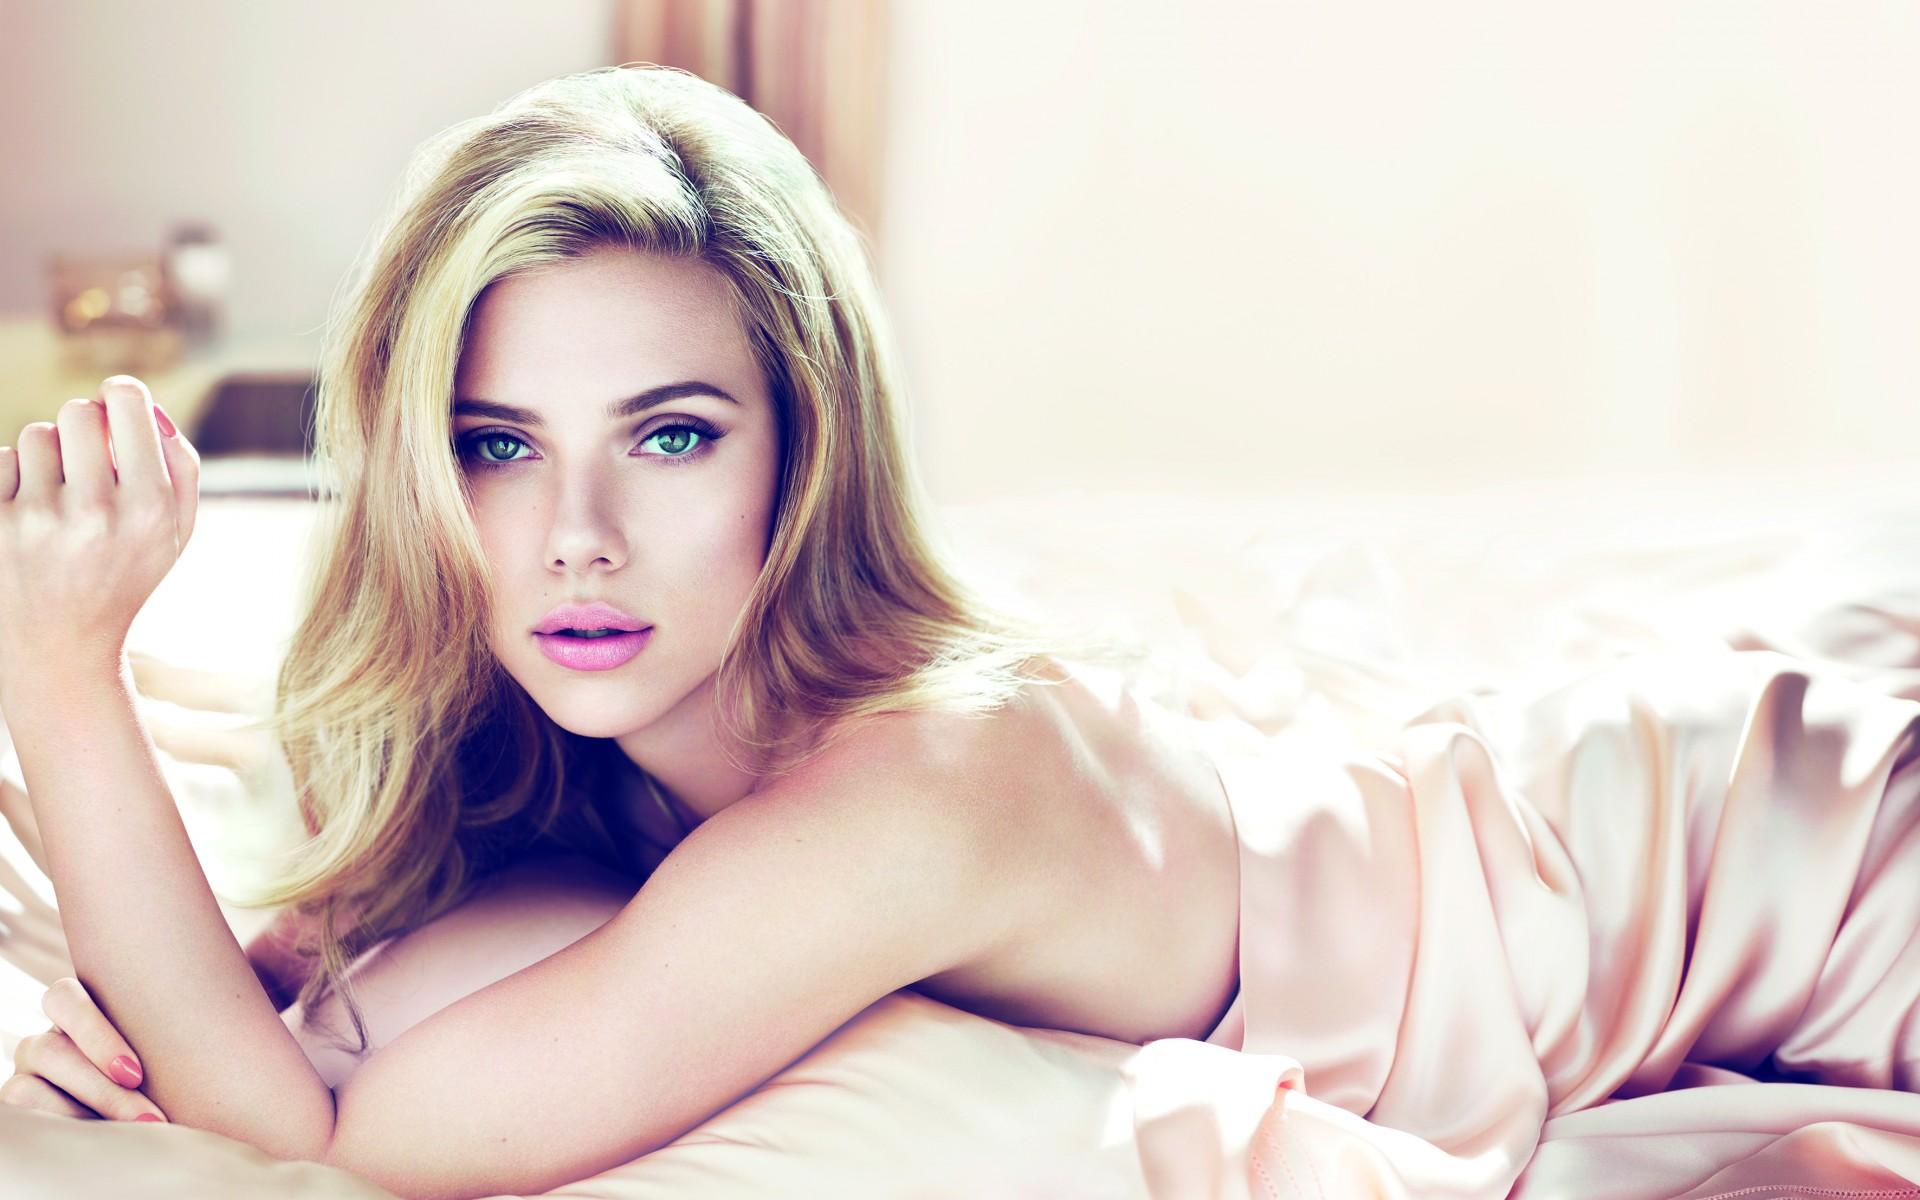 High Quality Hds Pics Of Scarlett Johansson As Redhead: Scarlett Johansson Wallpapers High Quality